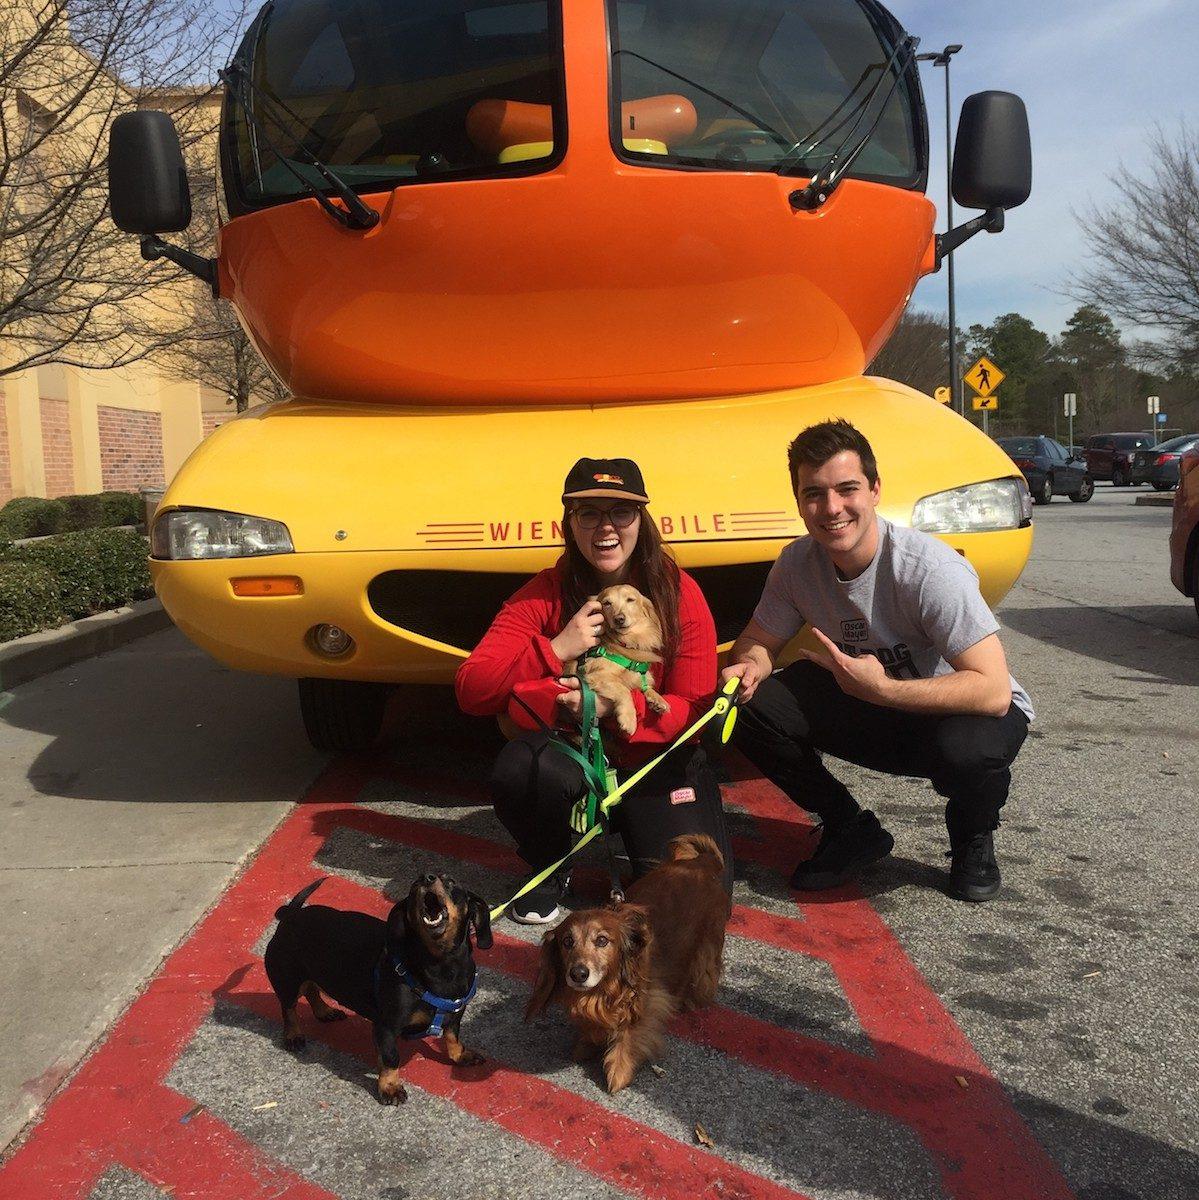 wienermobile with wiener dogs